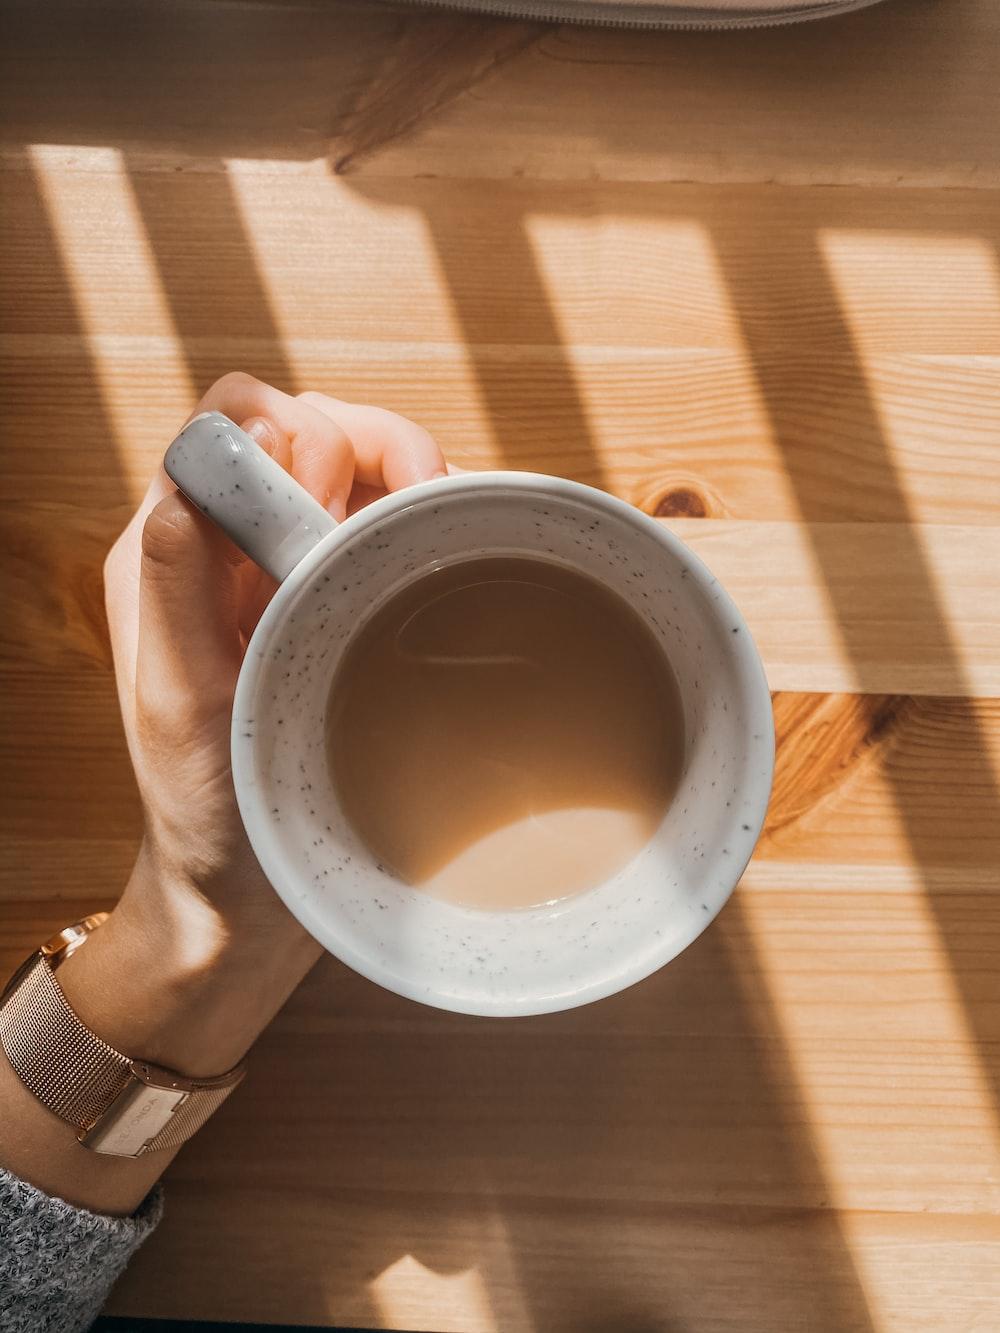 person holding white ceramic mug with black liquid